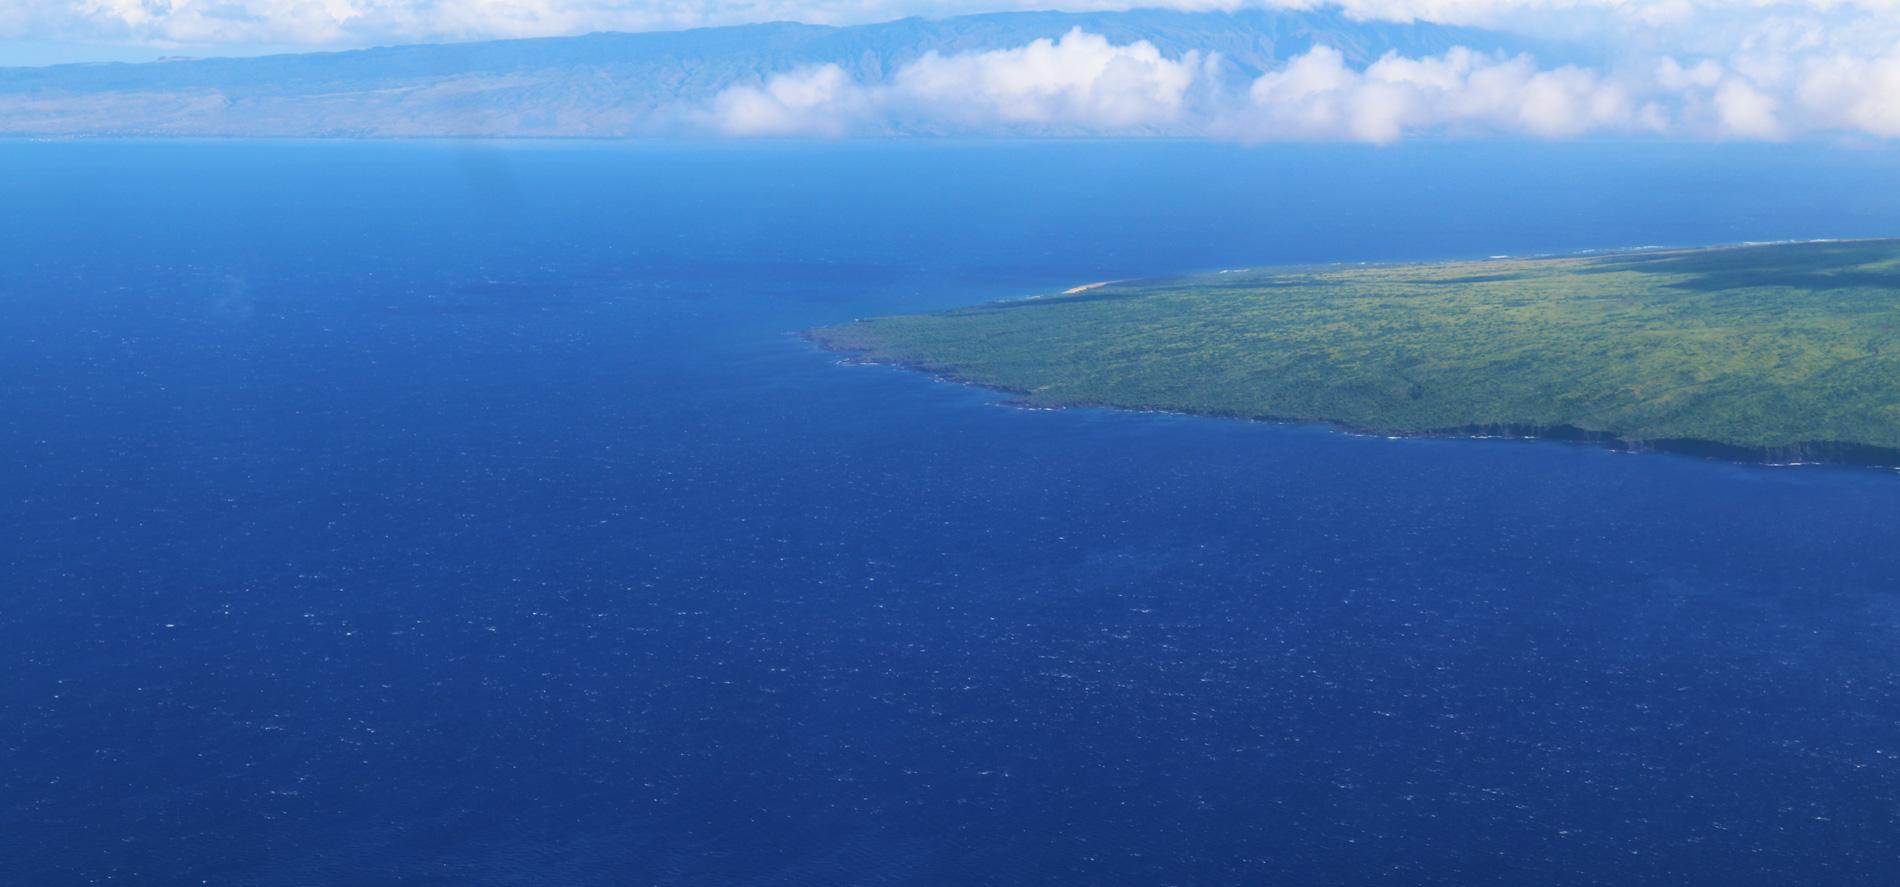 Lanai coast